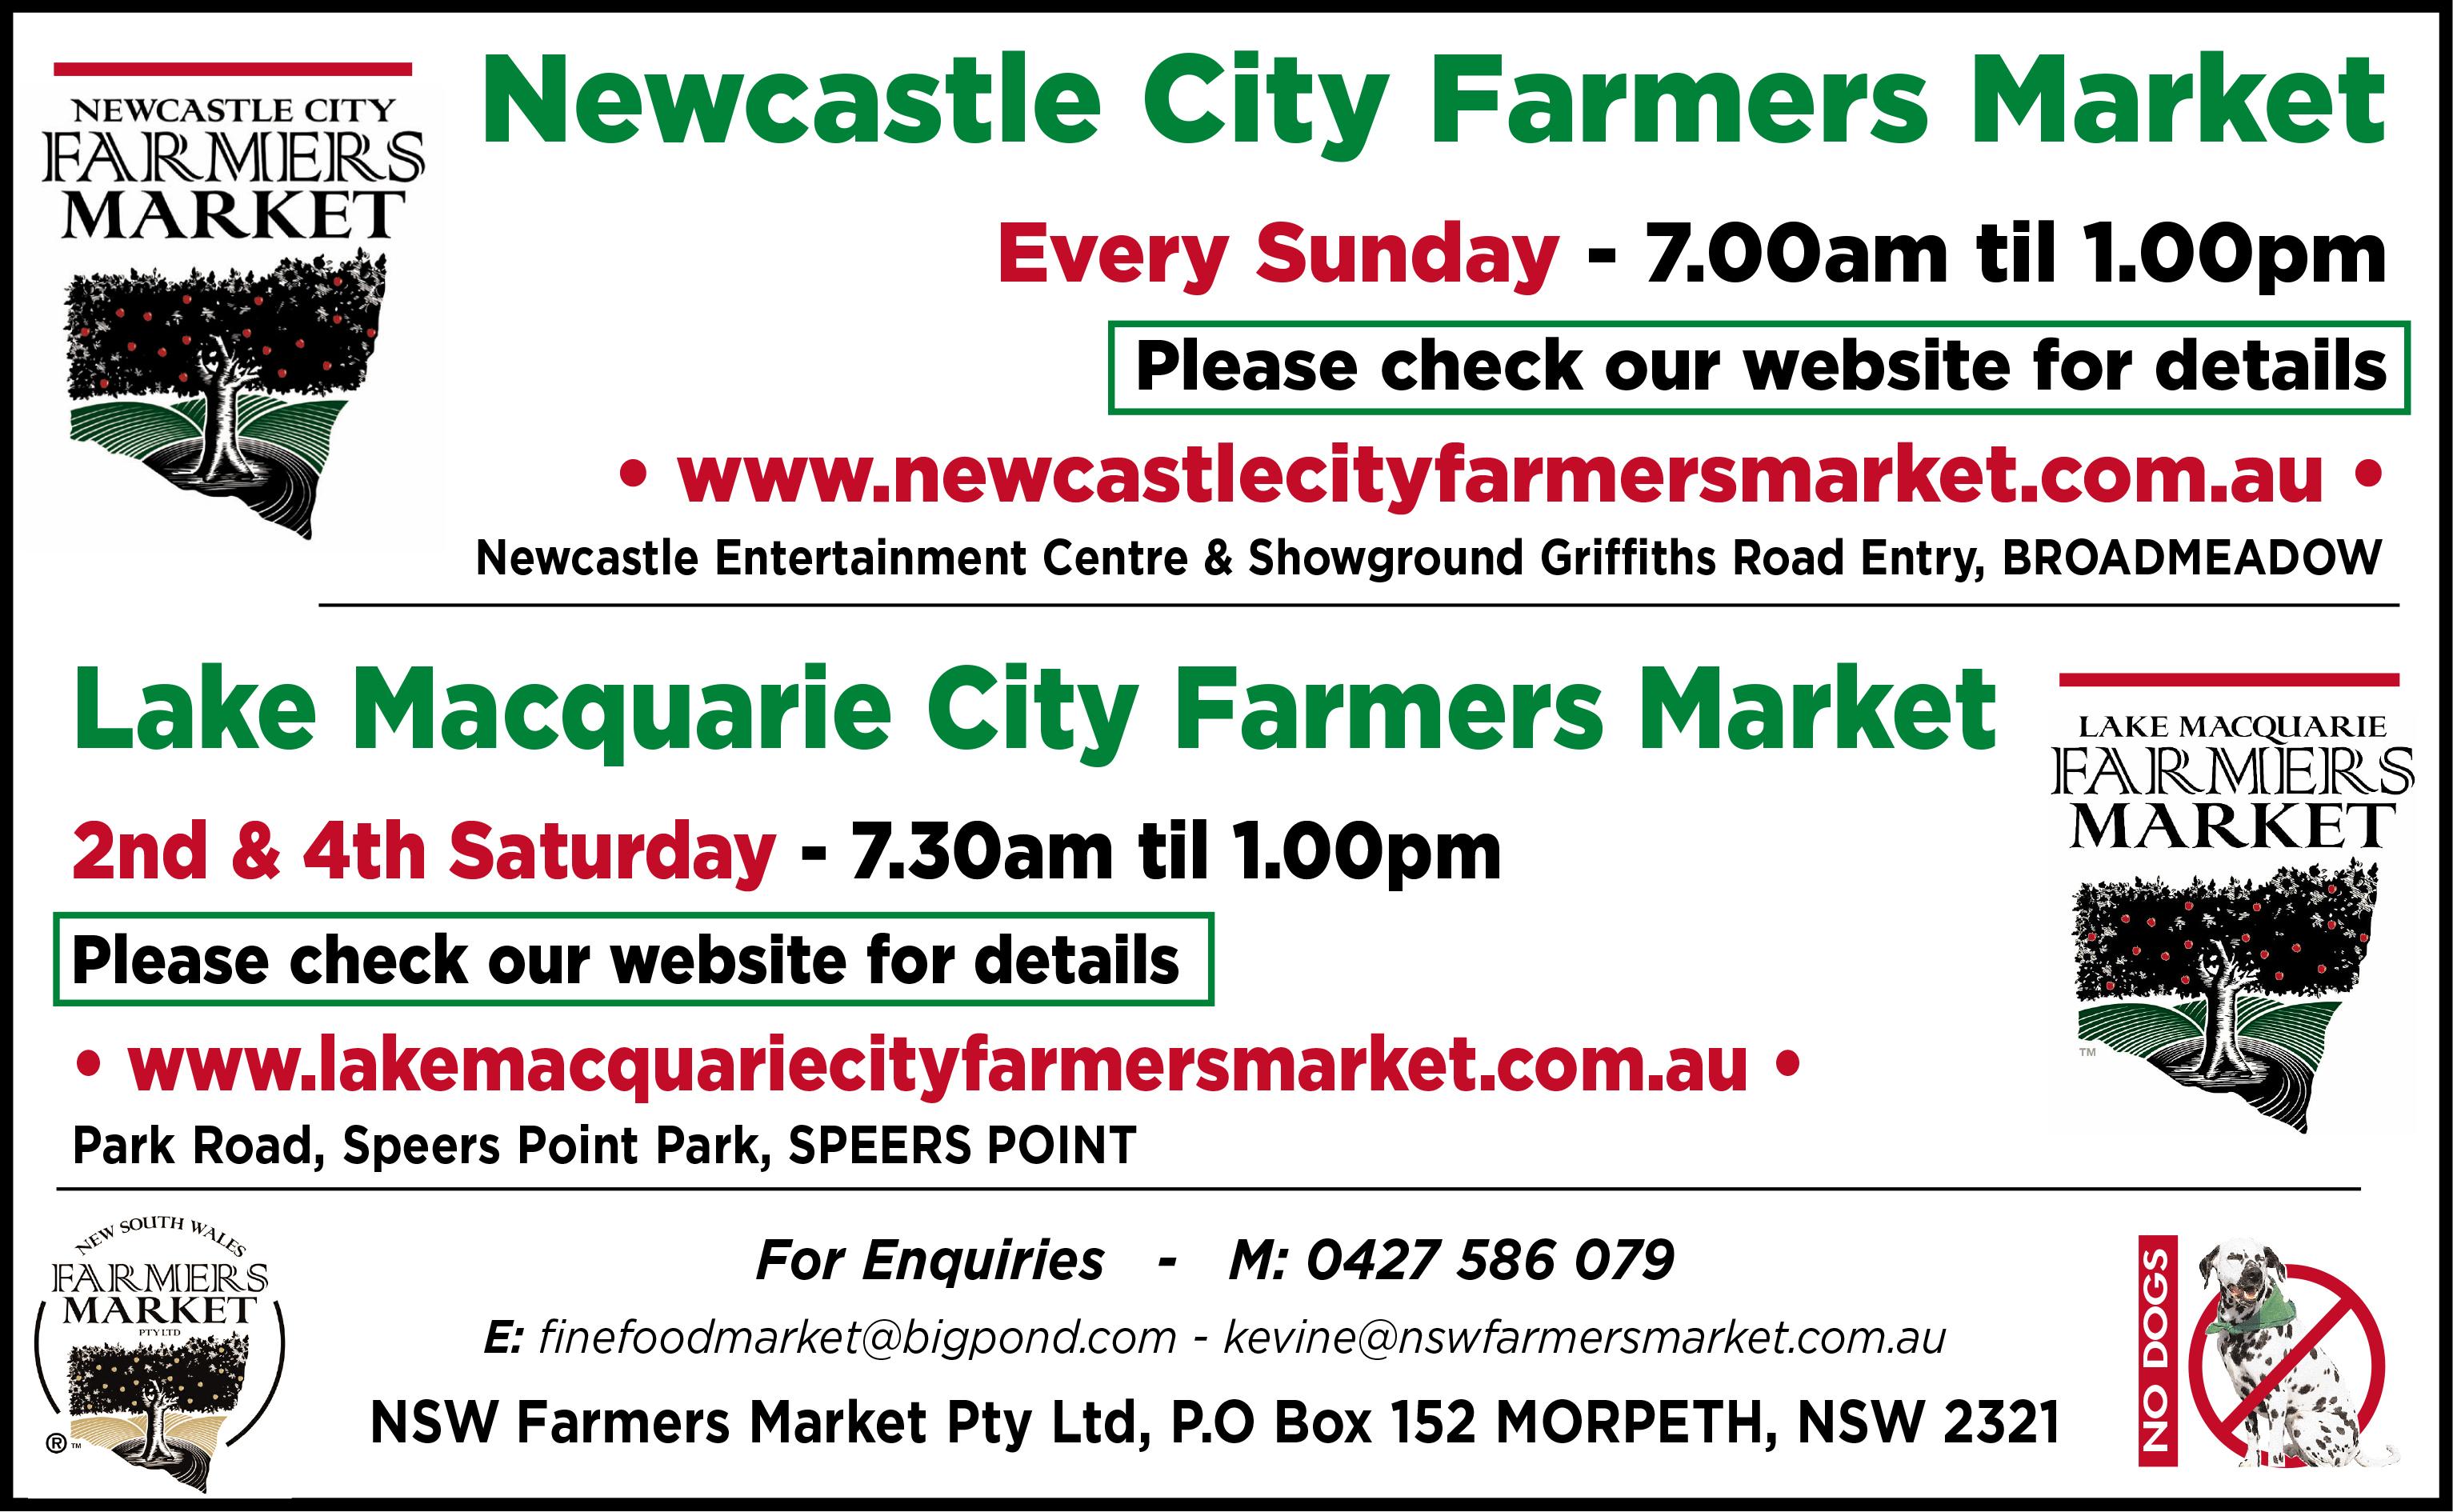 Newcastle City Farmers Markets